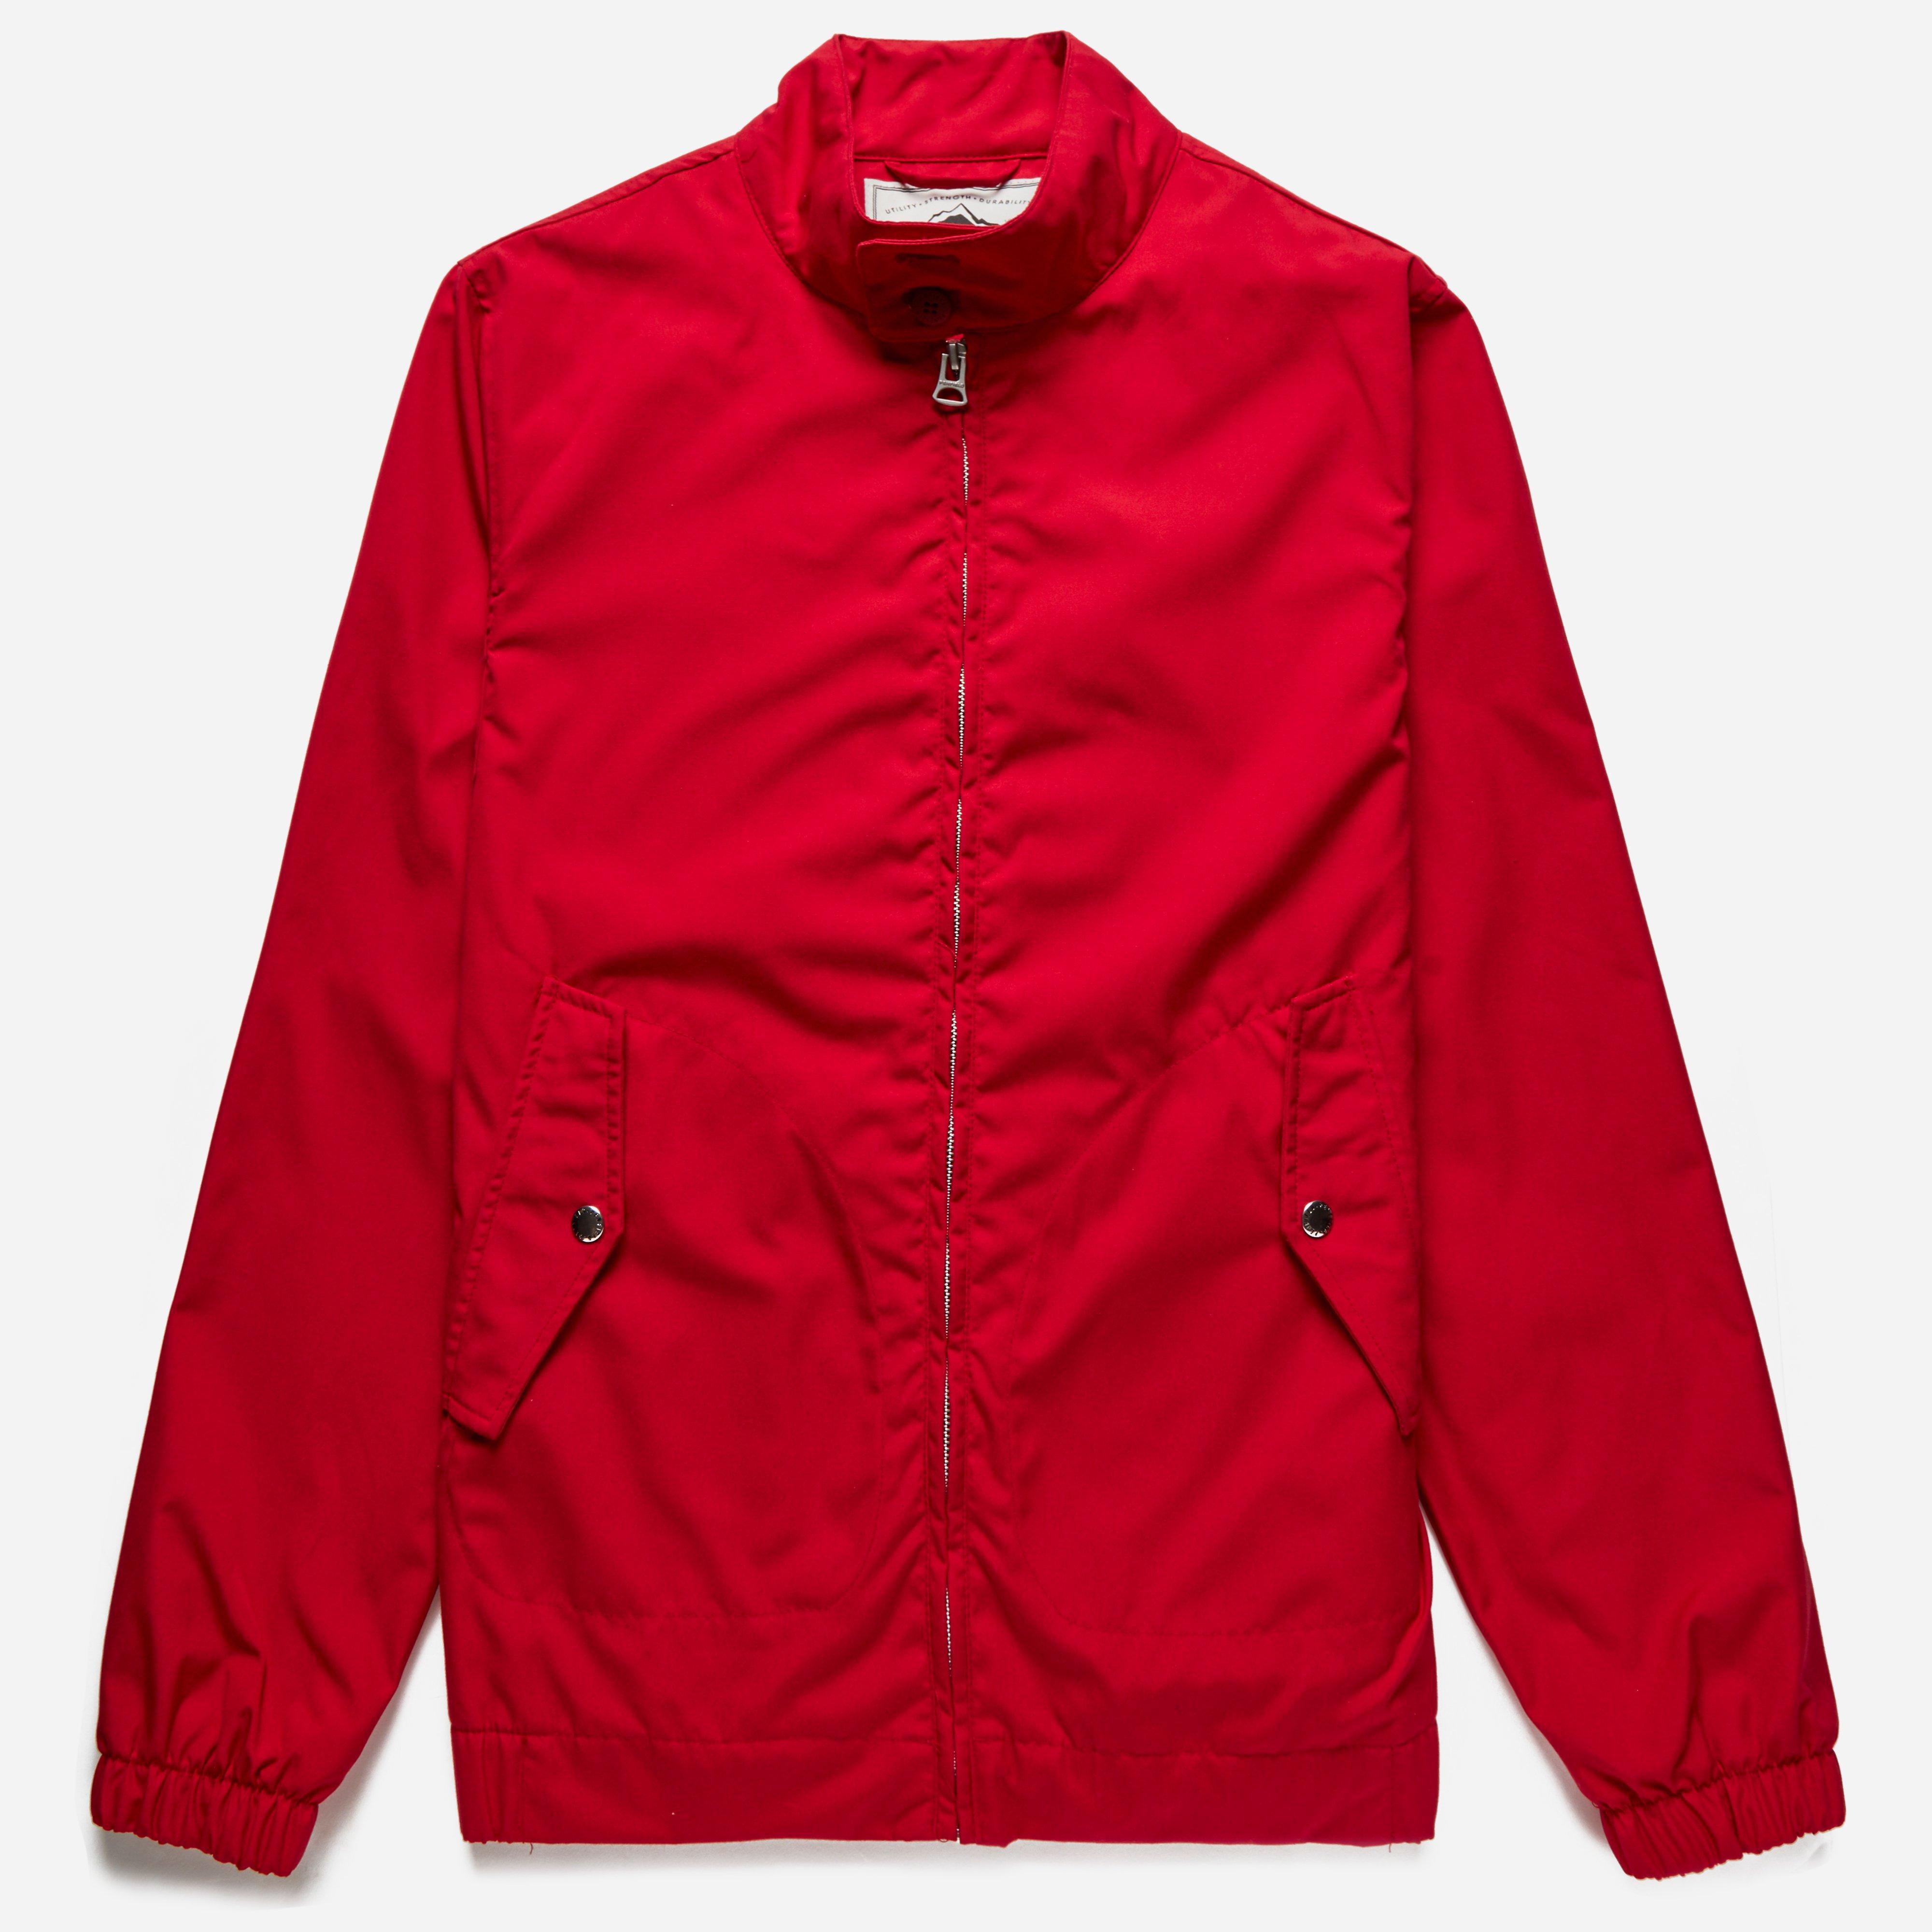 Penfield Seaford Jacket